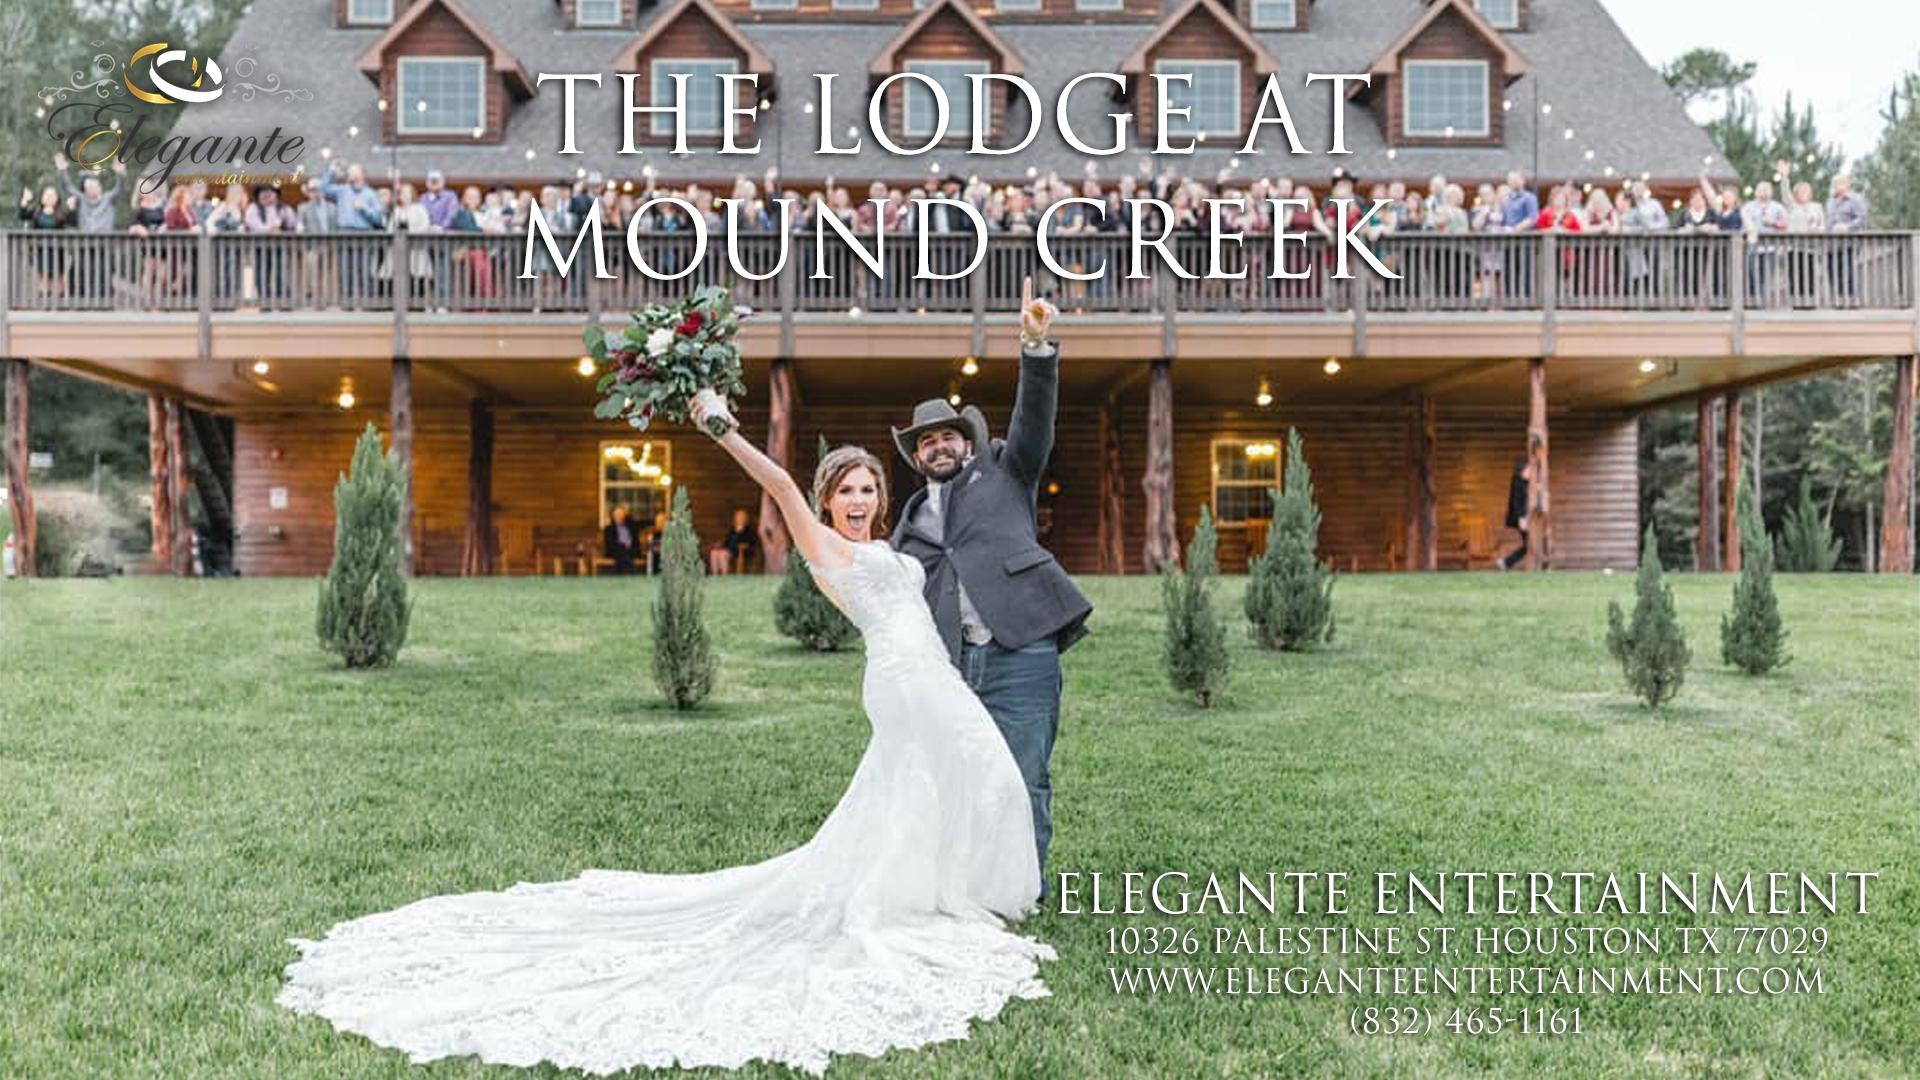 Best The Lodge at Mound Creek Wedding DJ 10-10-2021 in Montgomery Texas